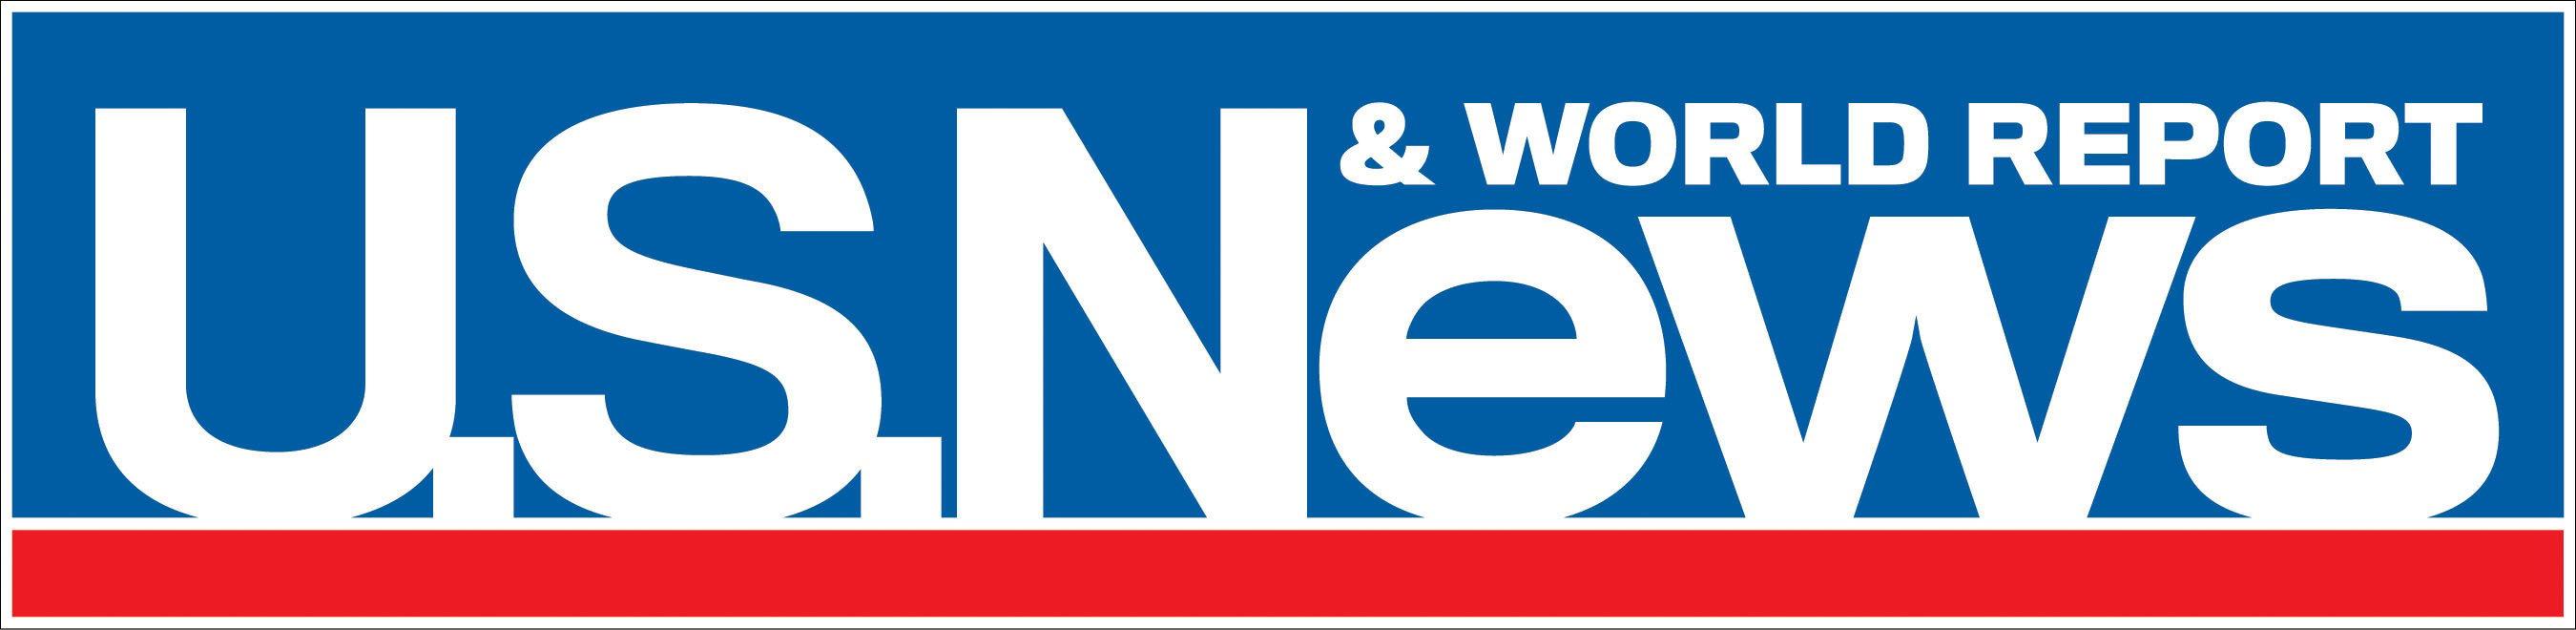 US-News-World-Report-logo-1